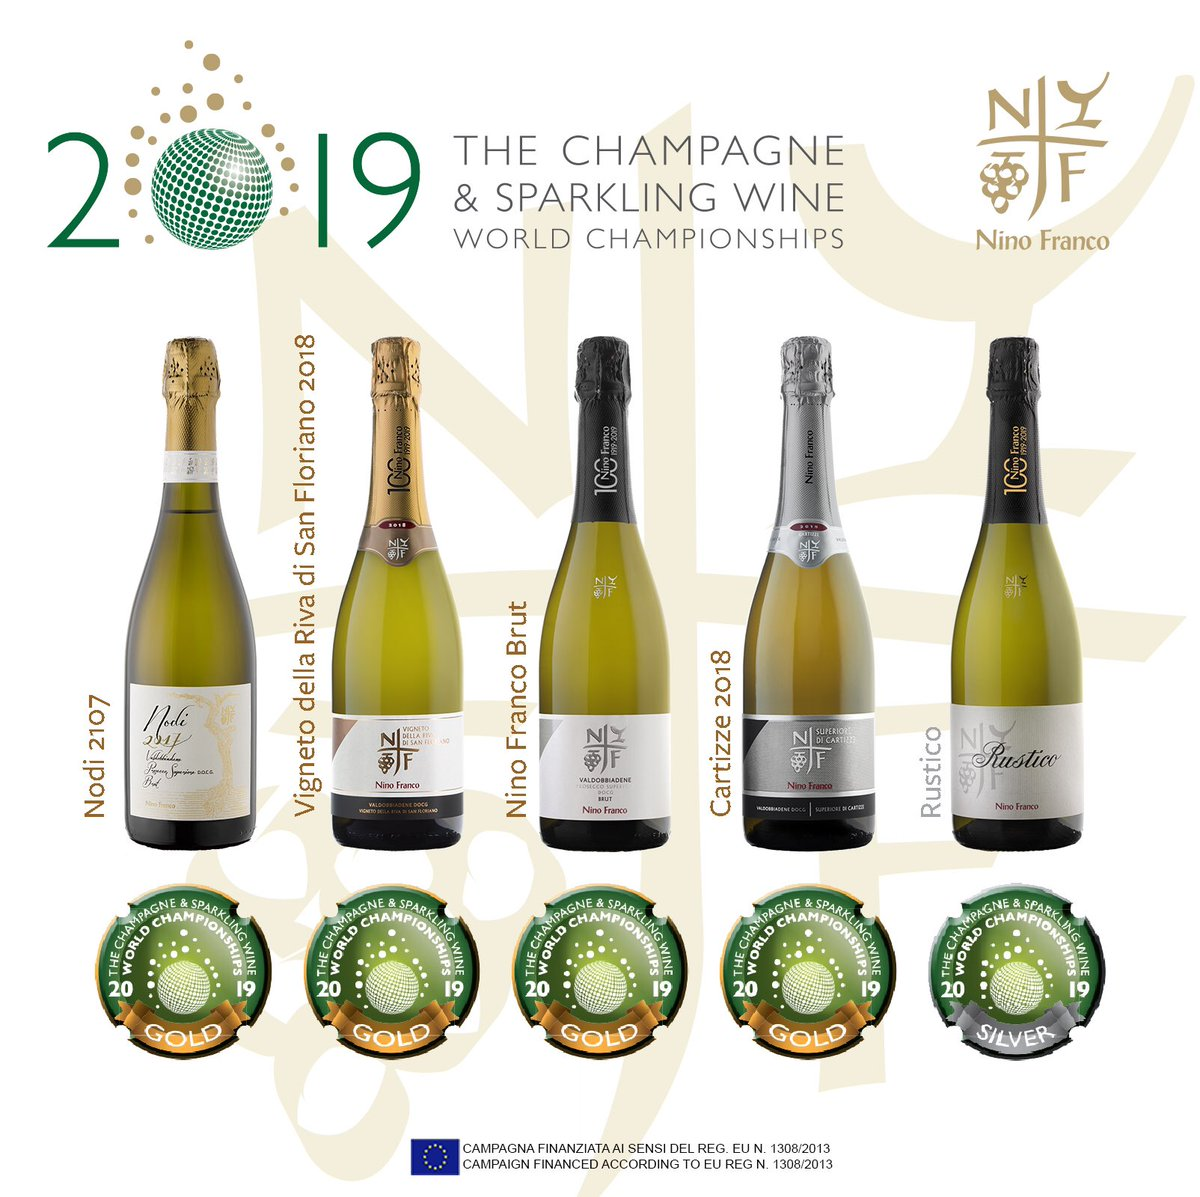 The results of the Champagne & Sparkling Wine World Championships! Thank you so much to @EssiAvellan @mrtomfizz Tony Jordan #NinoFranco1919 #ProseccoSuperiore #Valdobbiadene #cswwc #cswwc2019 #WineAwards #Nodi #VignetodellaRivadiSanFloriano #Cartizze #NinoFrancoBrut #Rustico